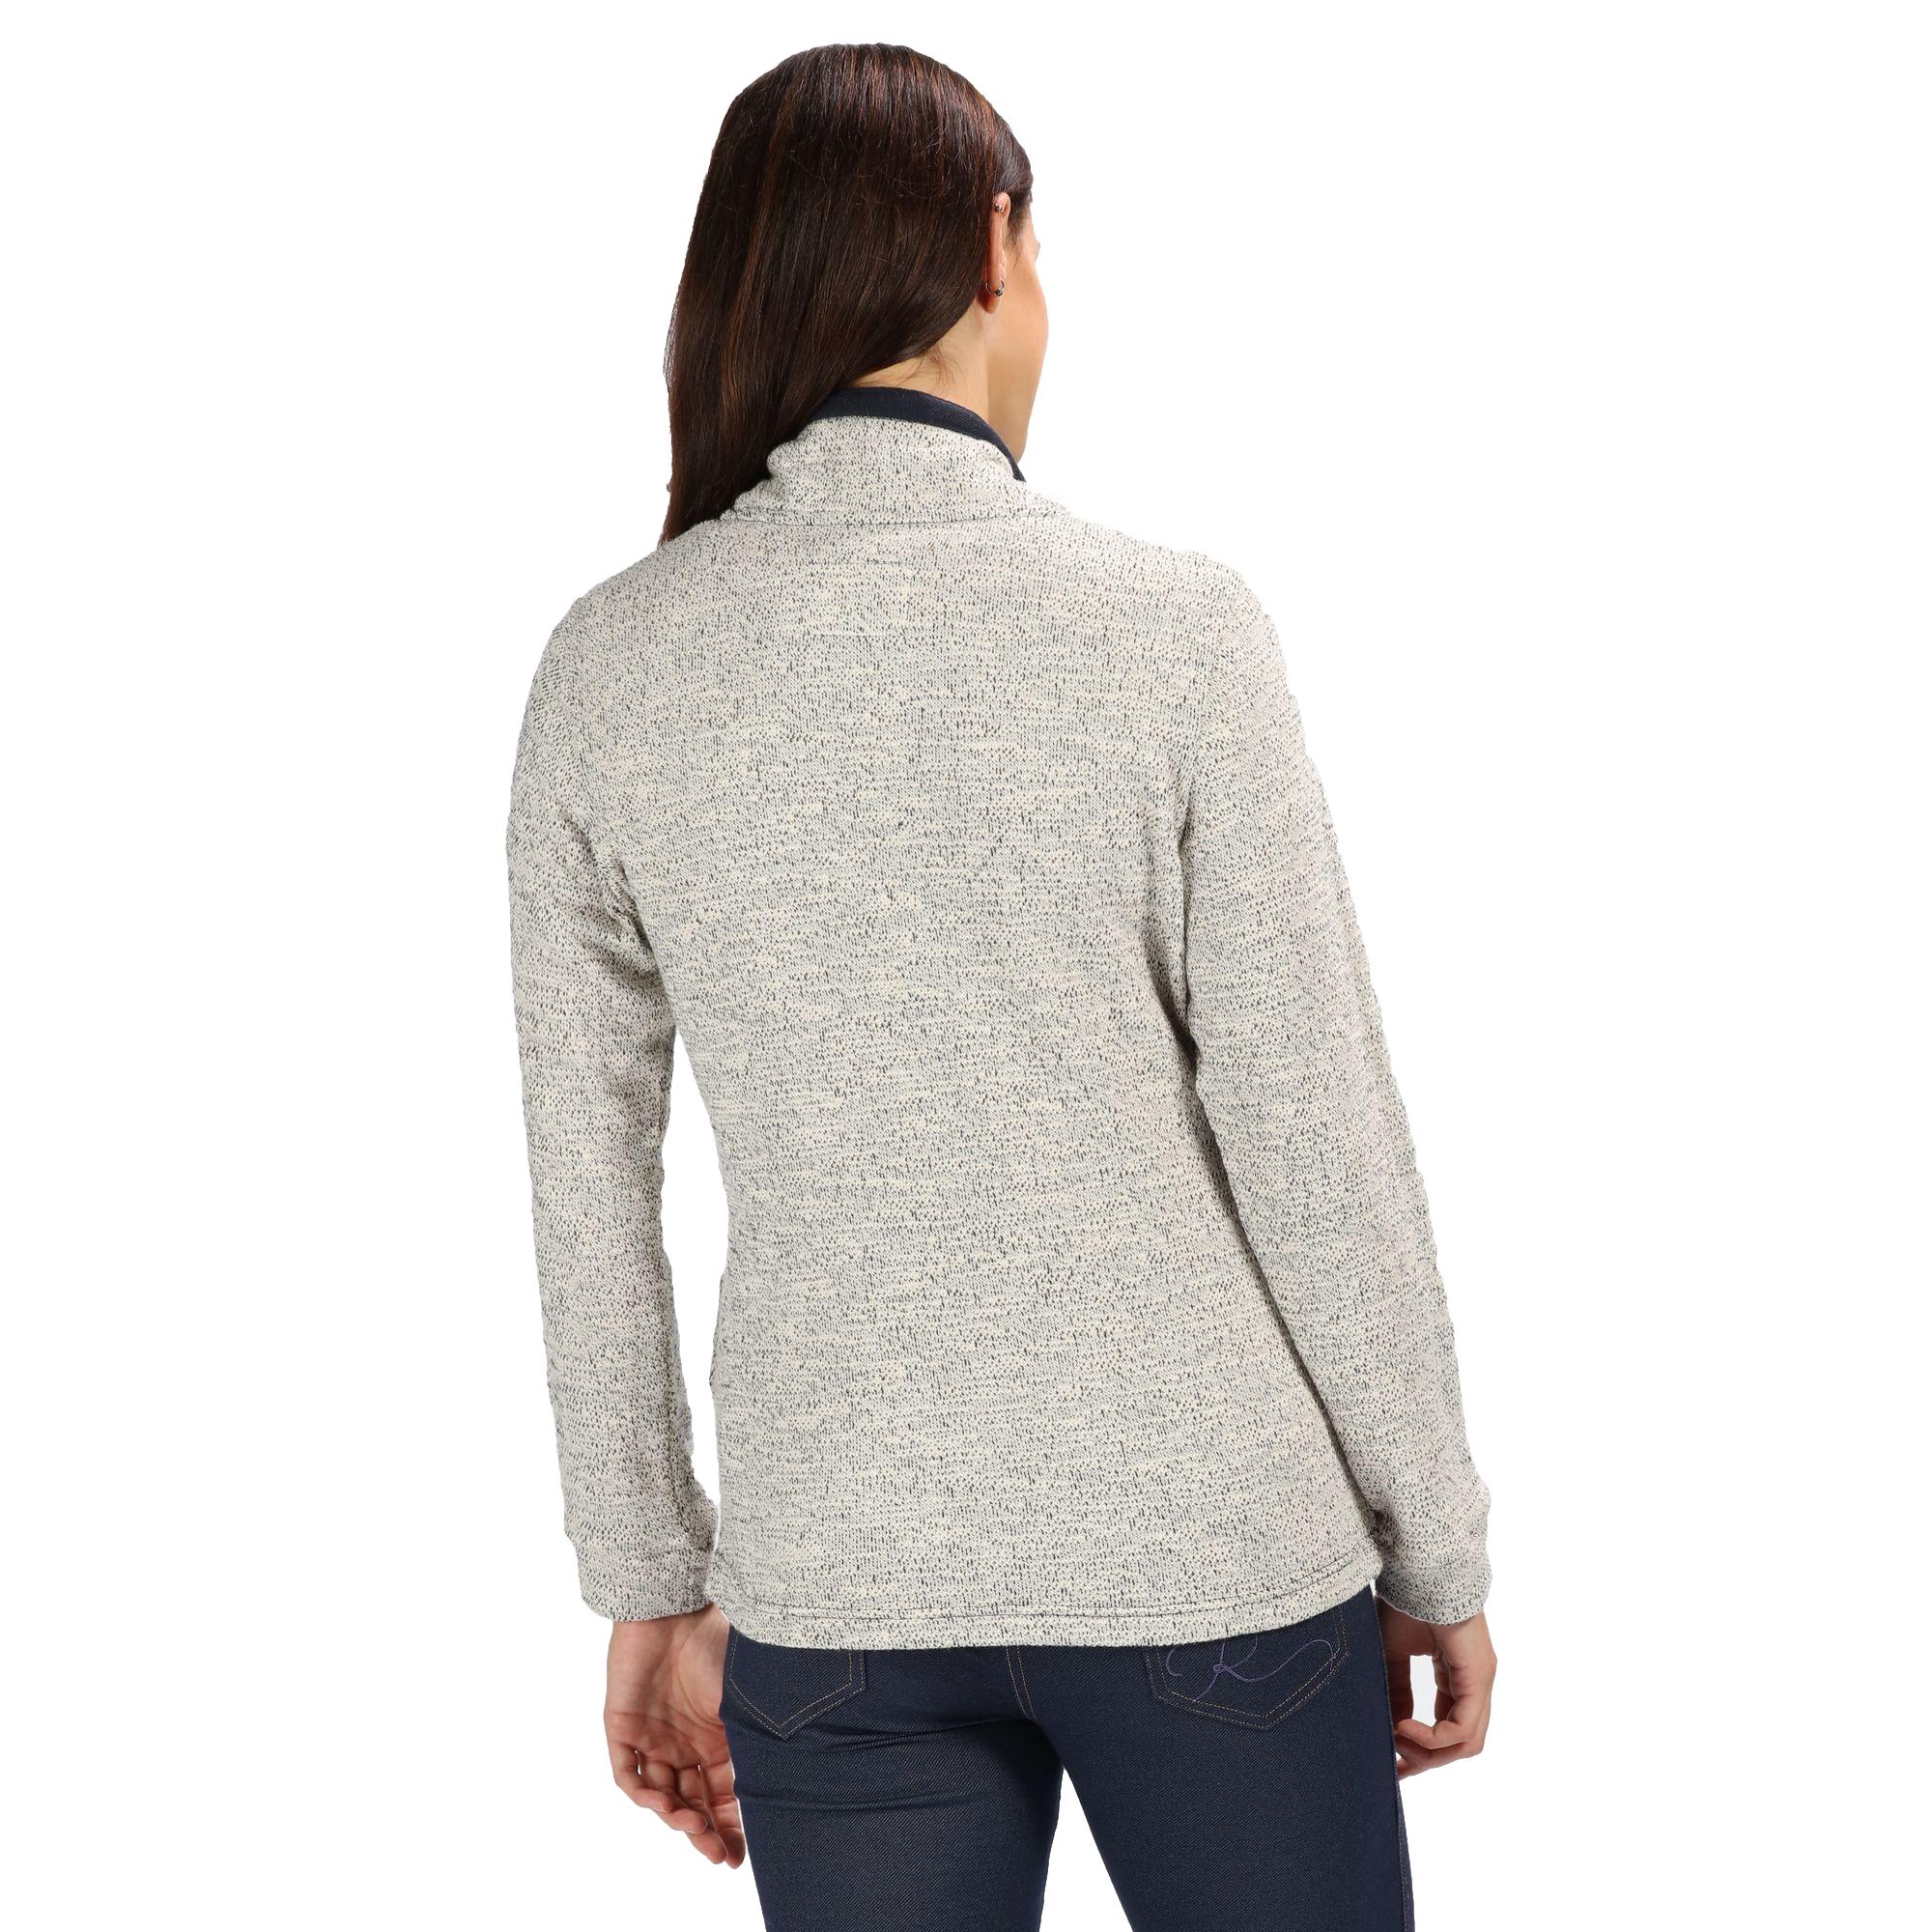 Regatta-Odetta-Womens-Warm-Curved-Full-Zip-Fleece-Jacket-RRP-50 thumbnail 15